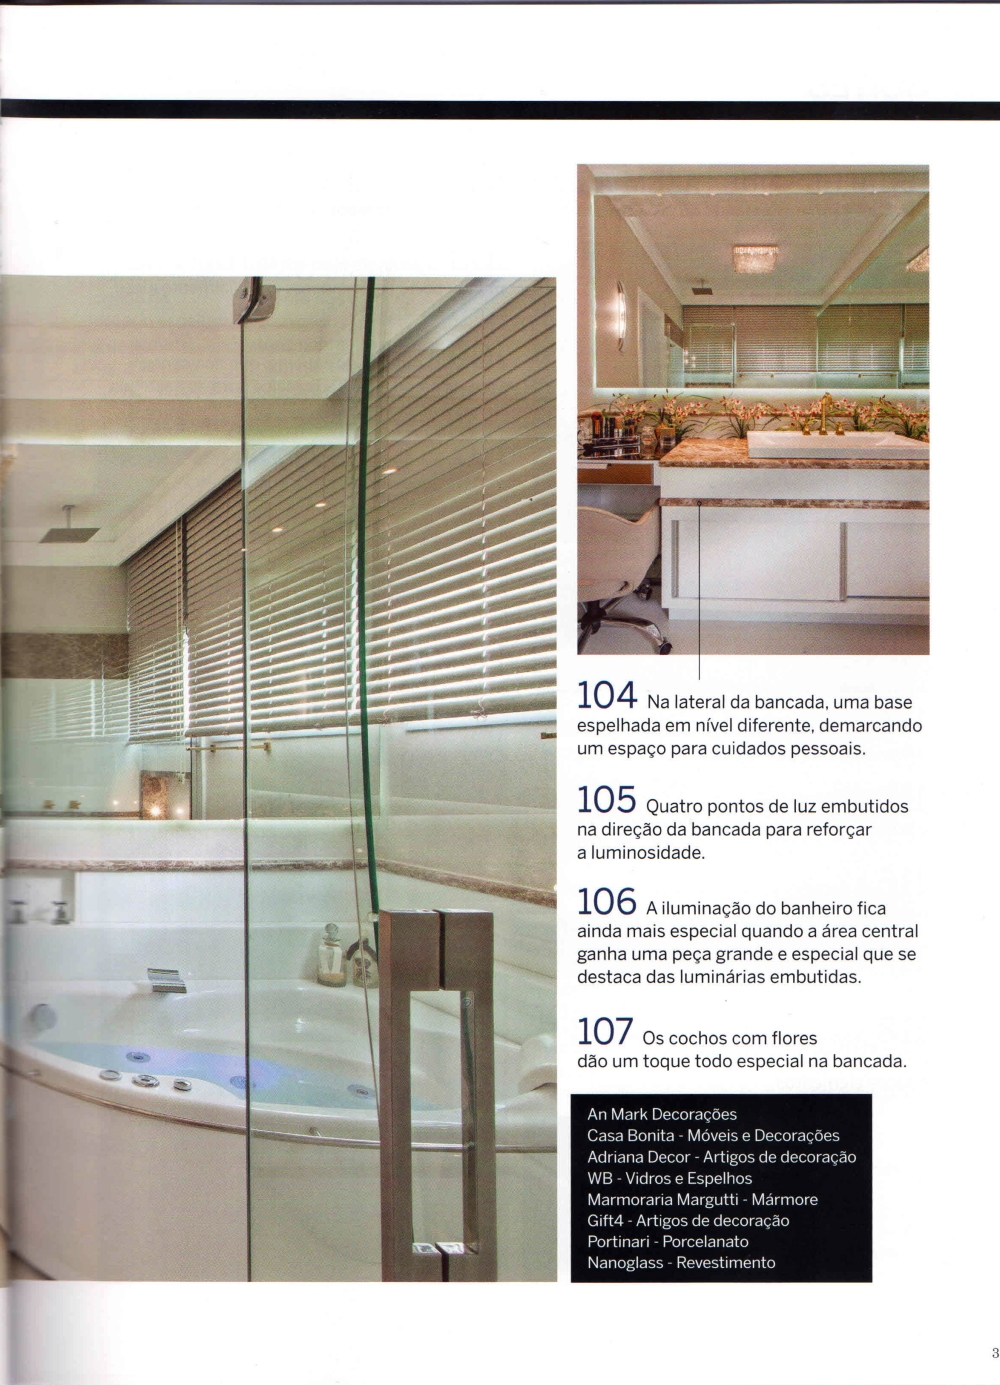 Arquiteto Aquiles Nicolas Kilaris Revista Guia 1001 ideias (7)